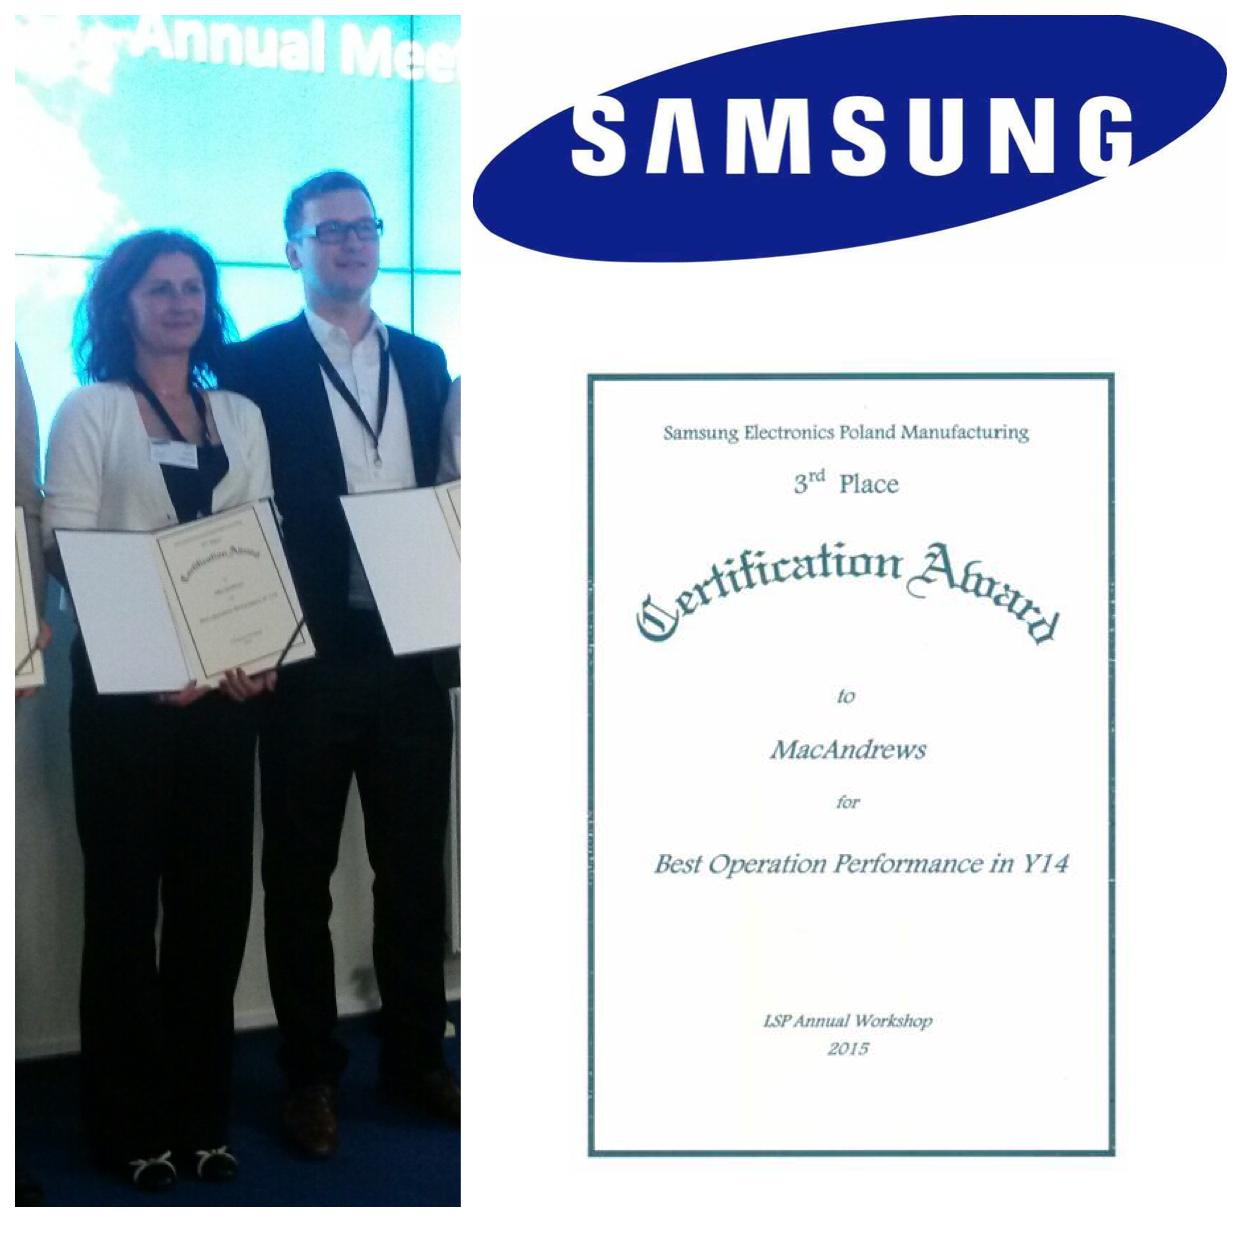 samsung-macandrews-2014-operations-performance-awards-poland